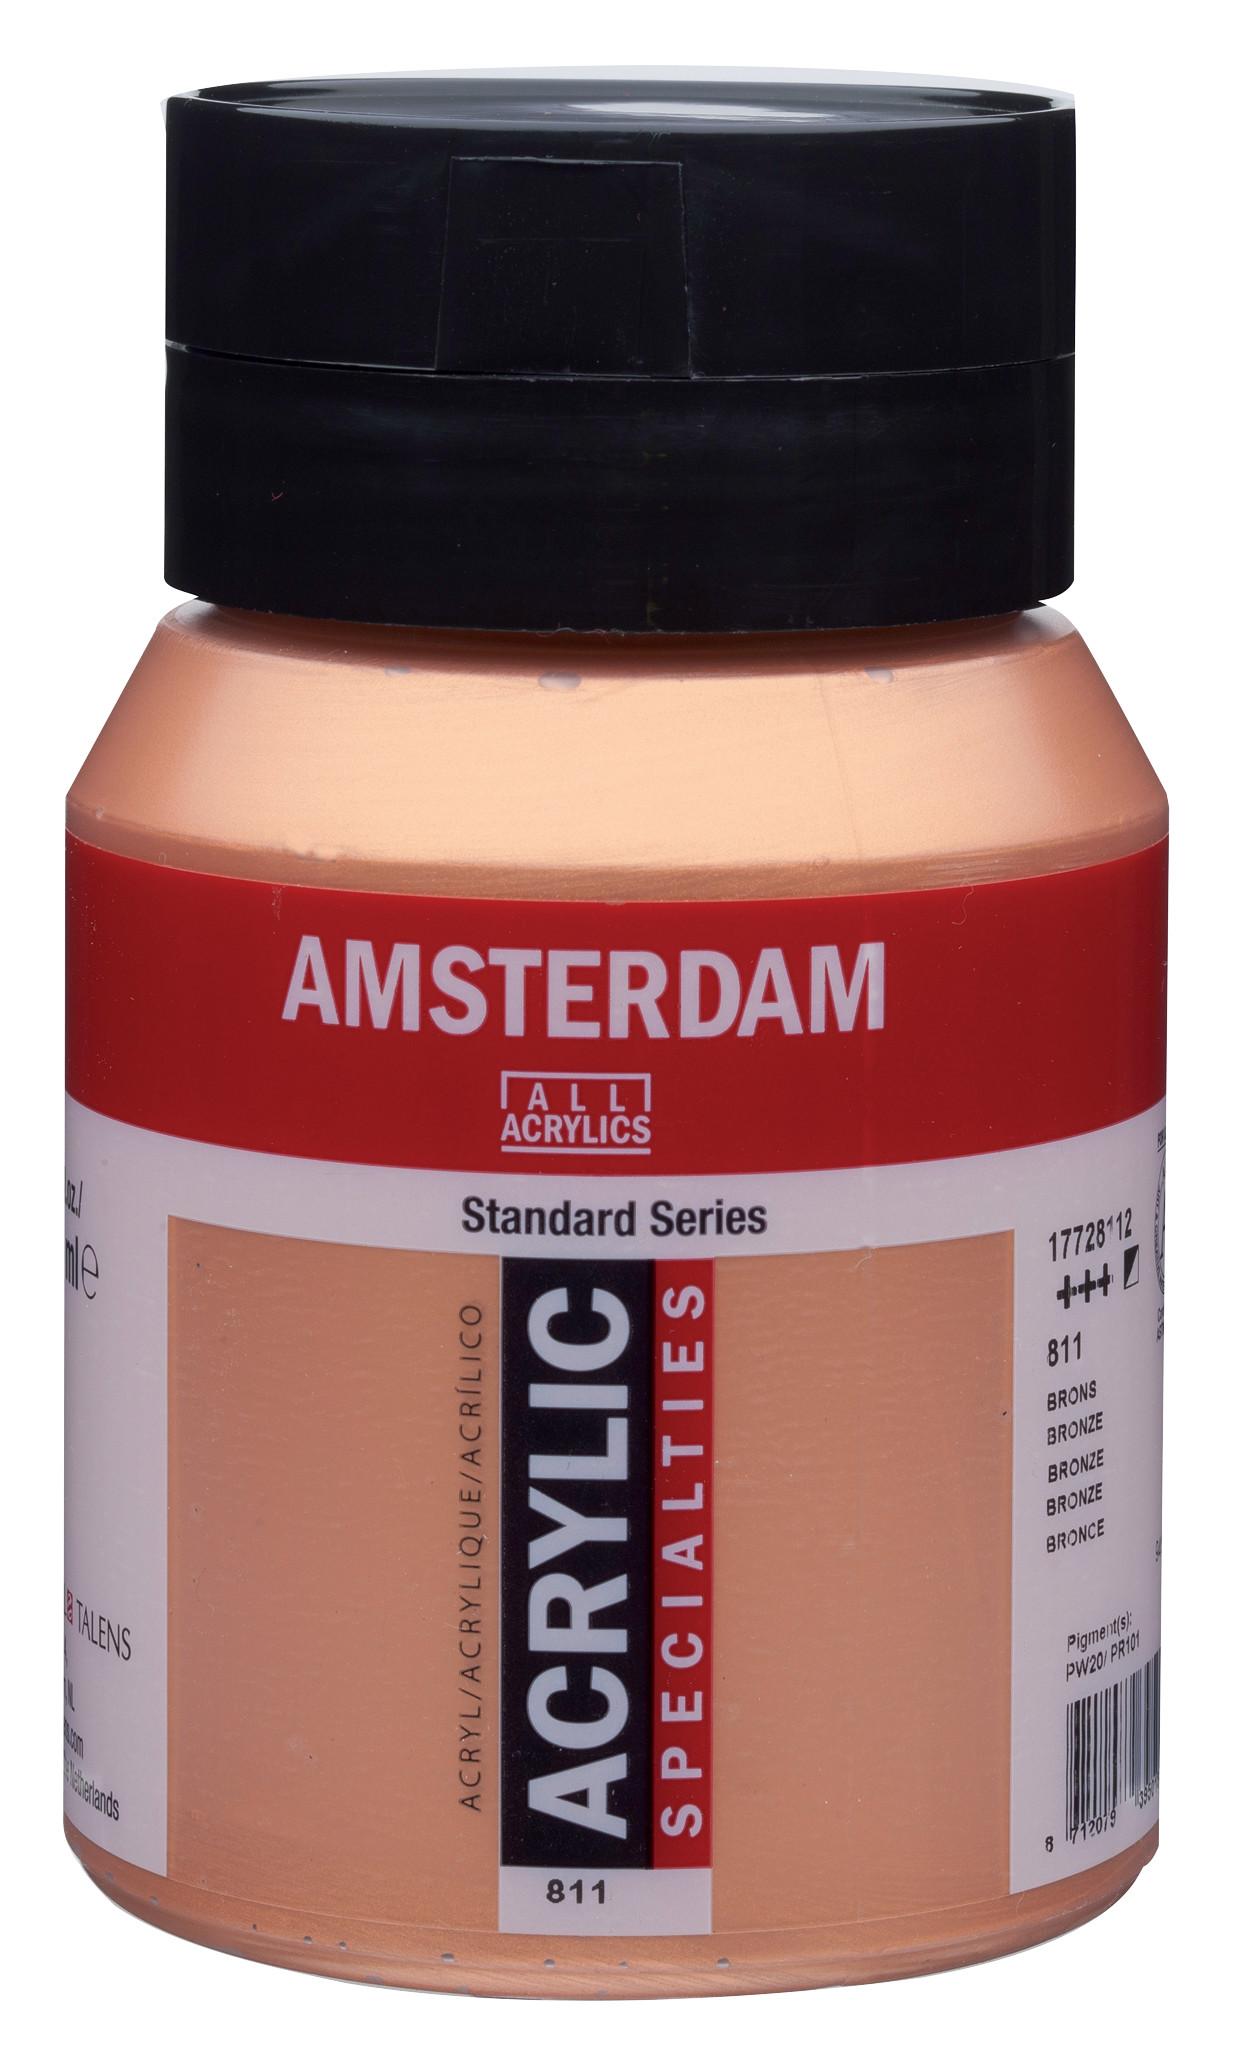 Amsterdam Standard Series Acrylic Jar 500 ml Bronze 811